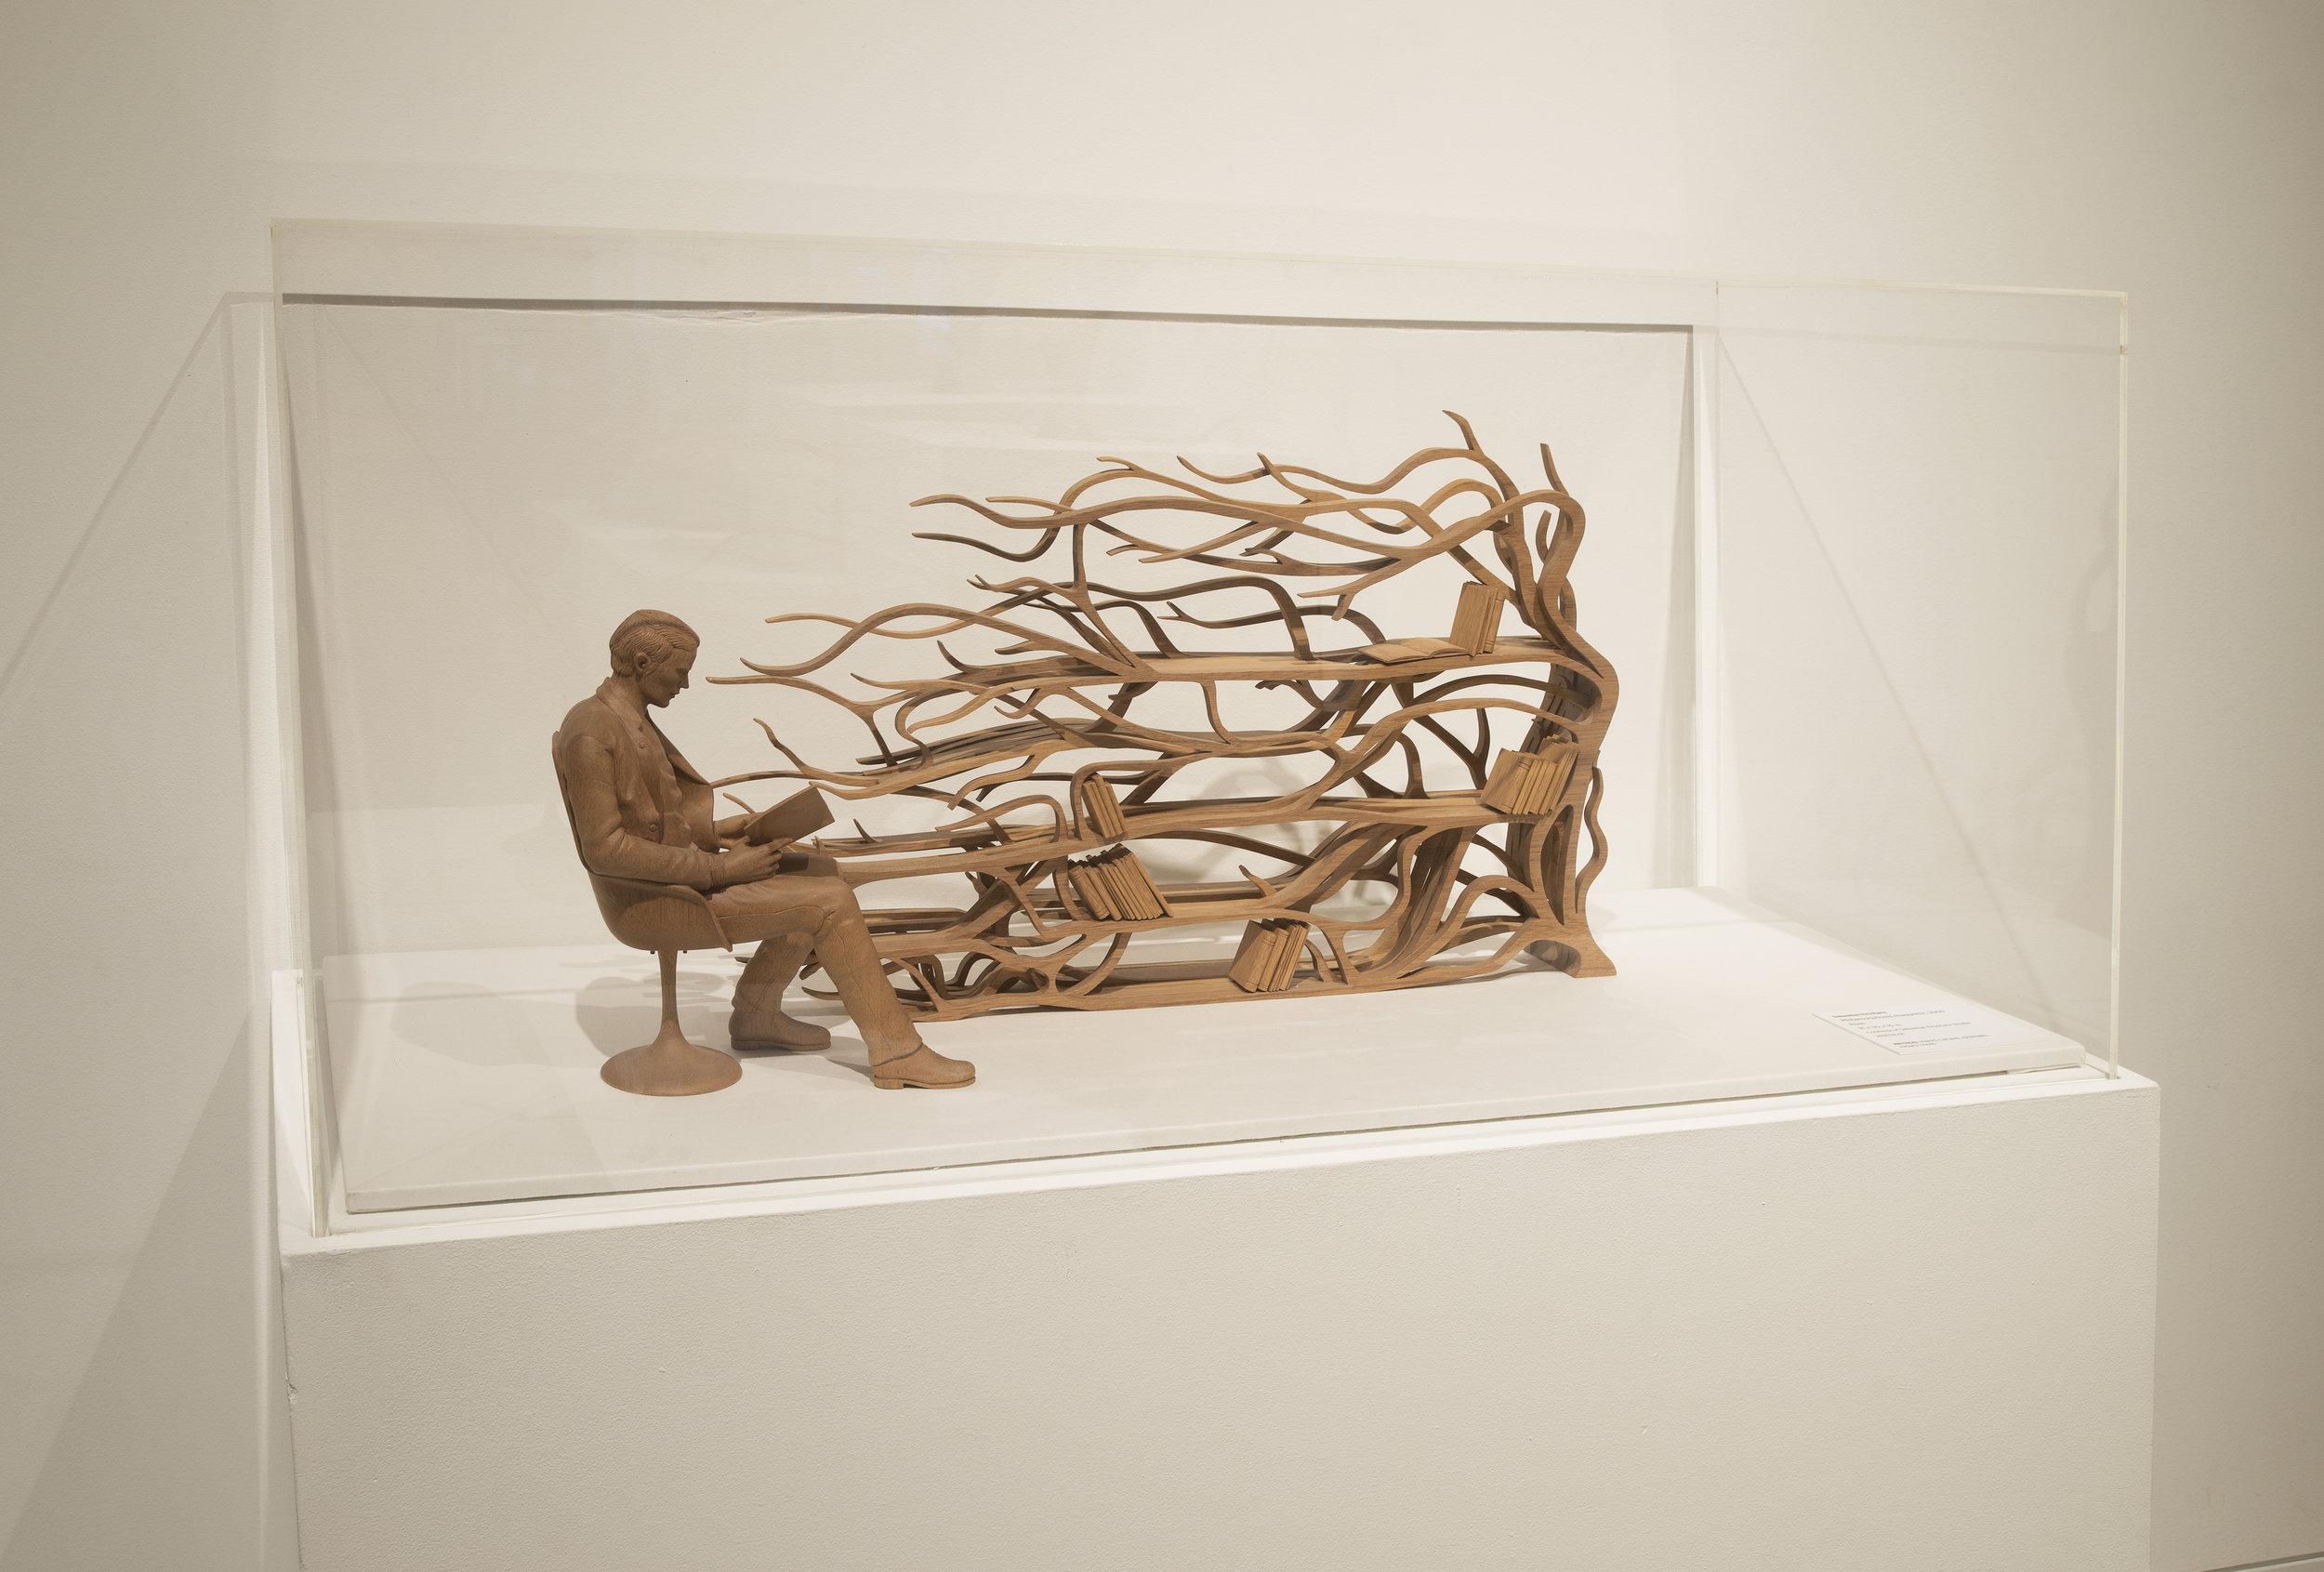 Sebastian ErraZuriz,  Metamorphosis maquette  , 2009.Rauli.18 x 30 x 10 in.Courtesy of Sebastian Errazuriz Studio.2016.SE.01.Photo: John Carlano    METHOD:Hand carved, dremels,rotary tools